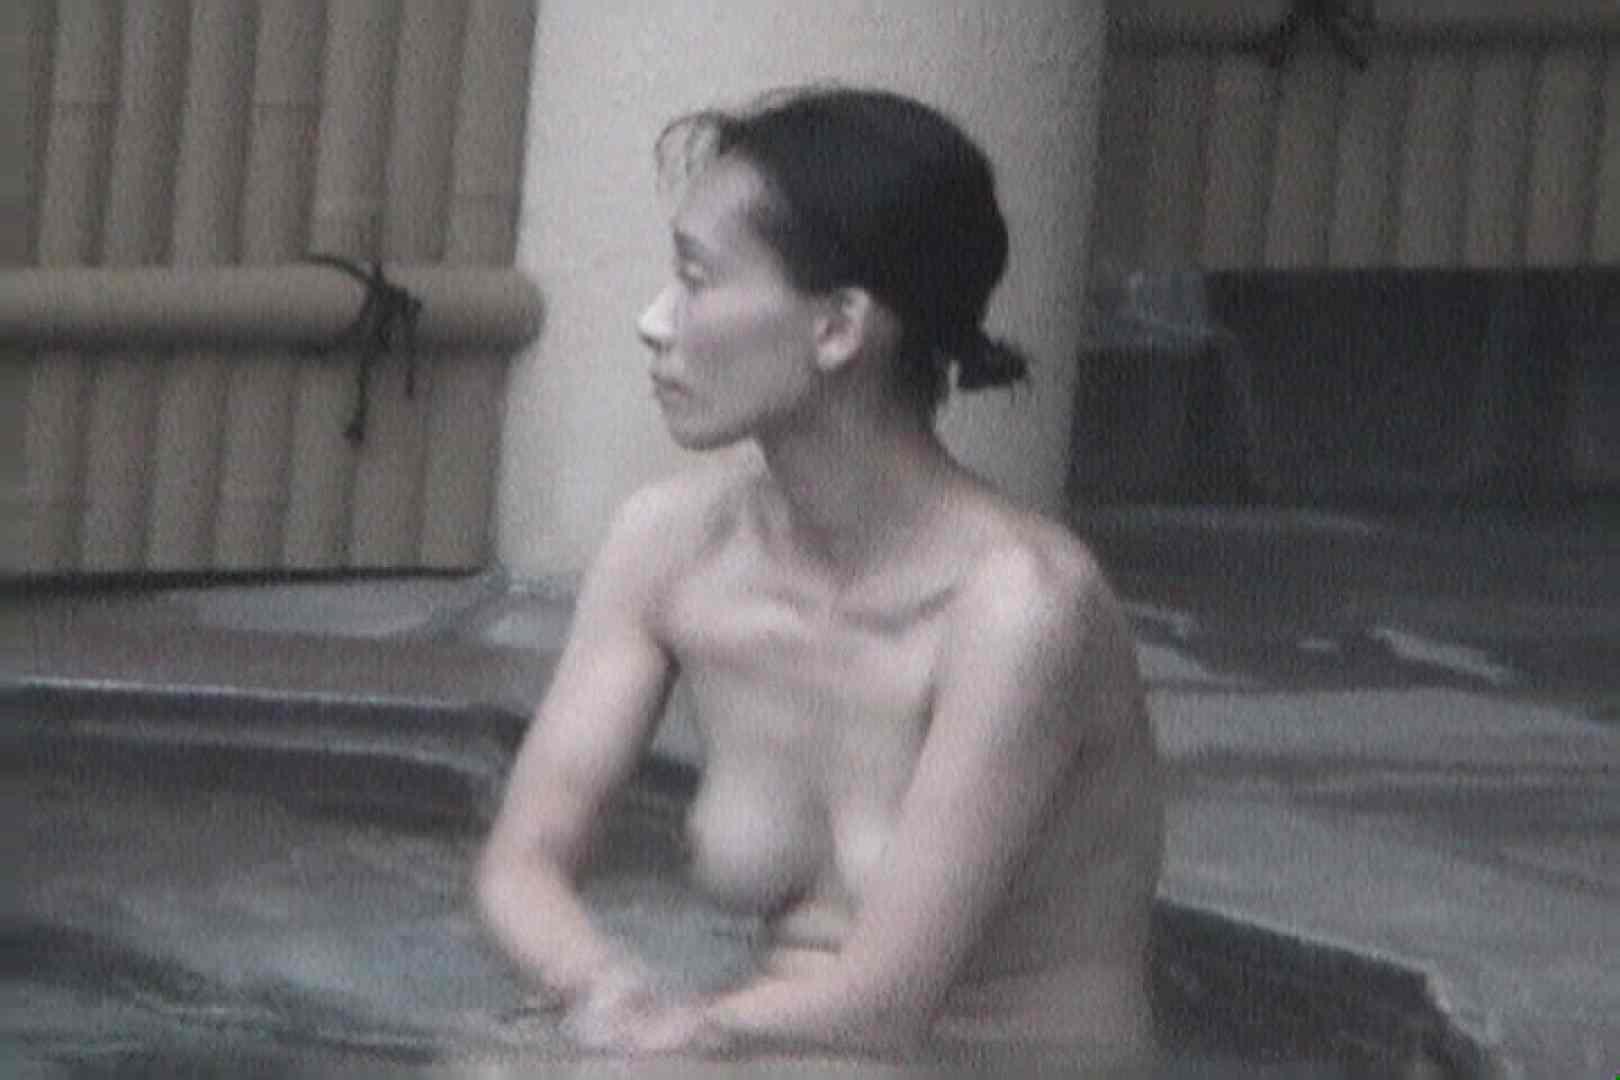 Aquaな露天風呂Vol.557 OLのエロ生活 | 露天風呂  34連発 4